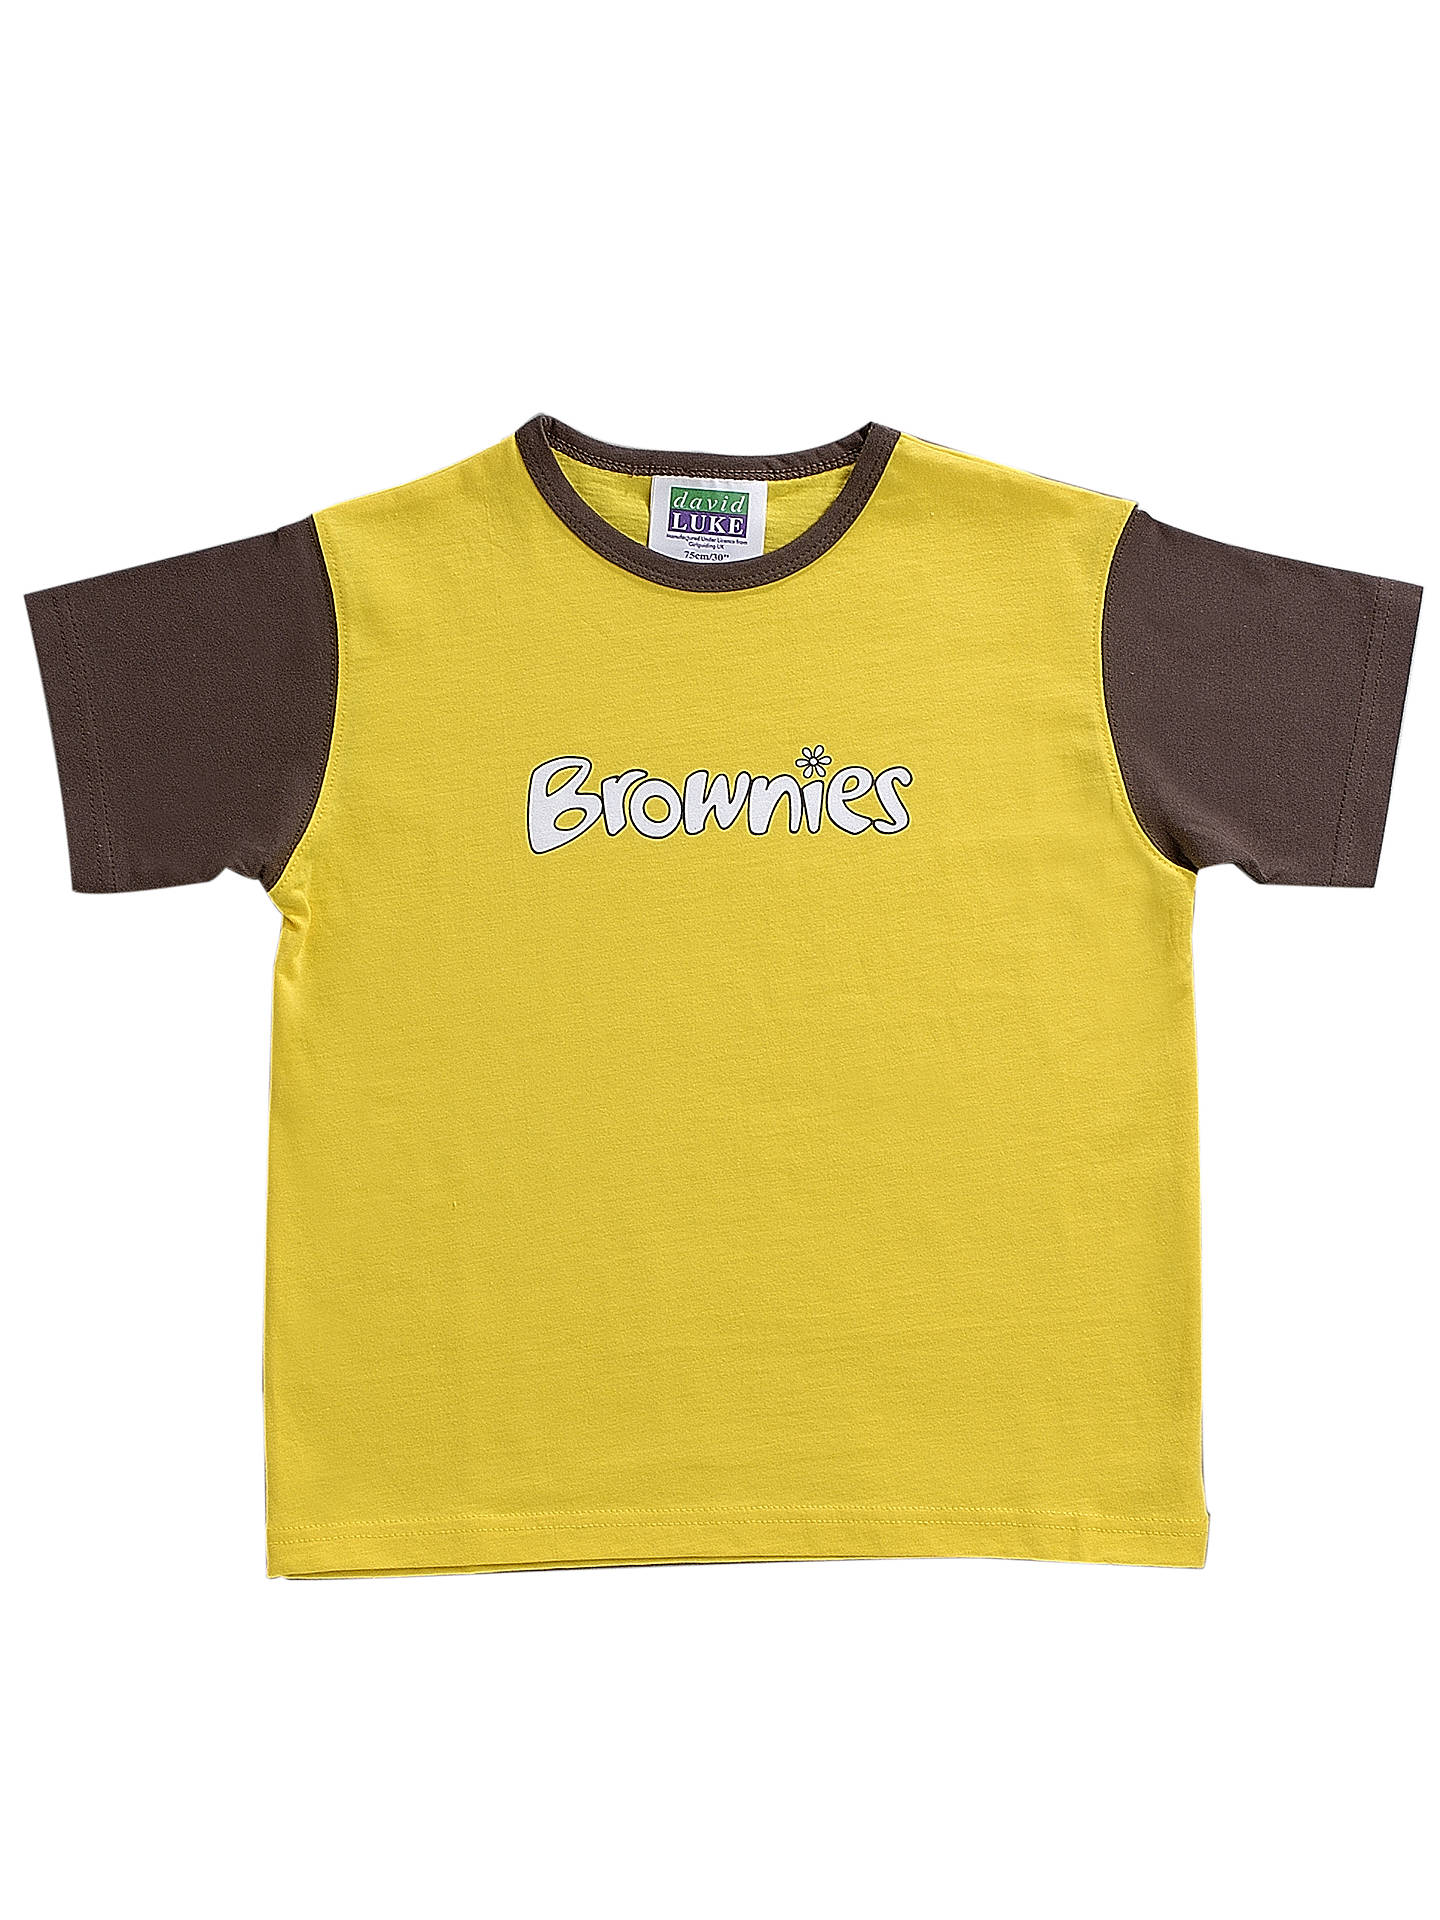 ef050d687 Buy Brownies Uniform Short Sleeve T-shirt, Yellow/Brown, Chest 26